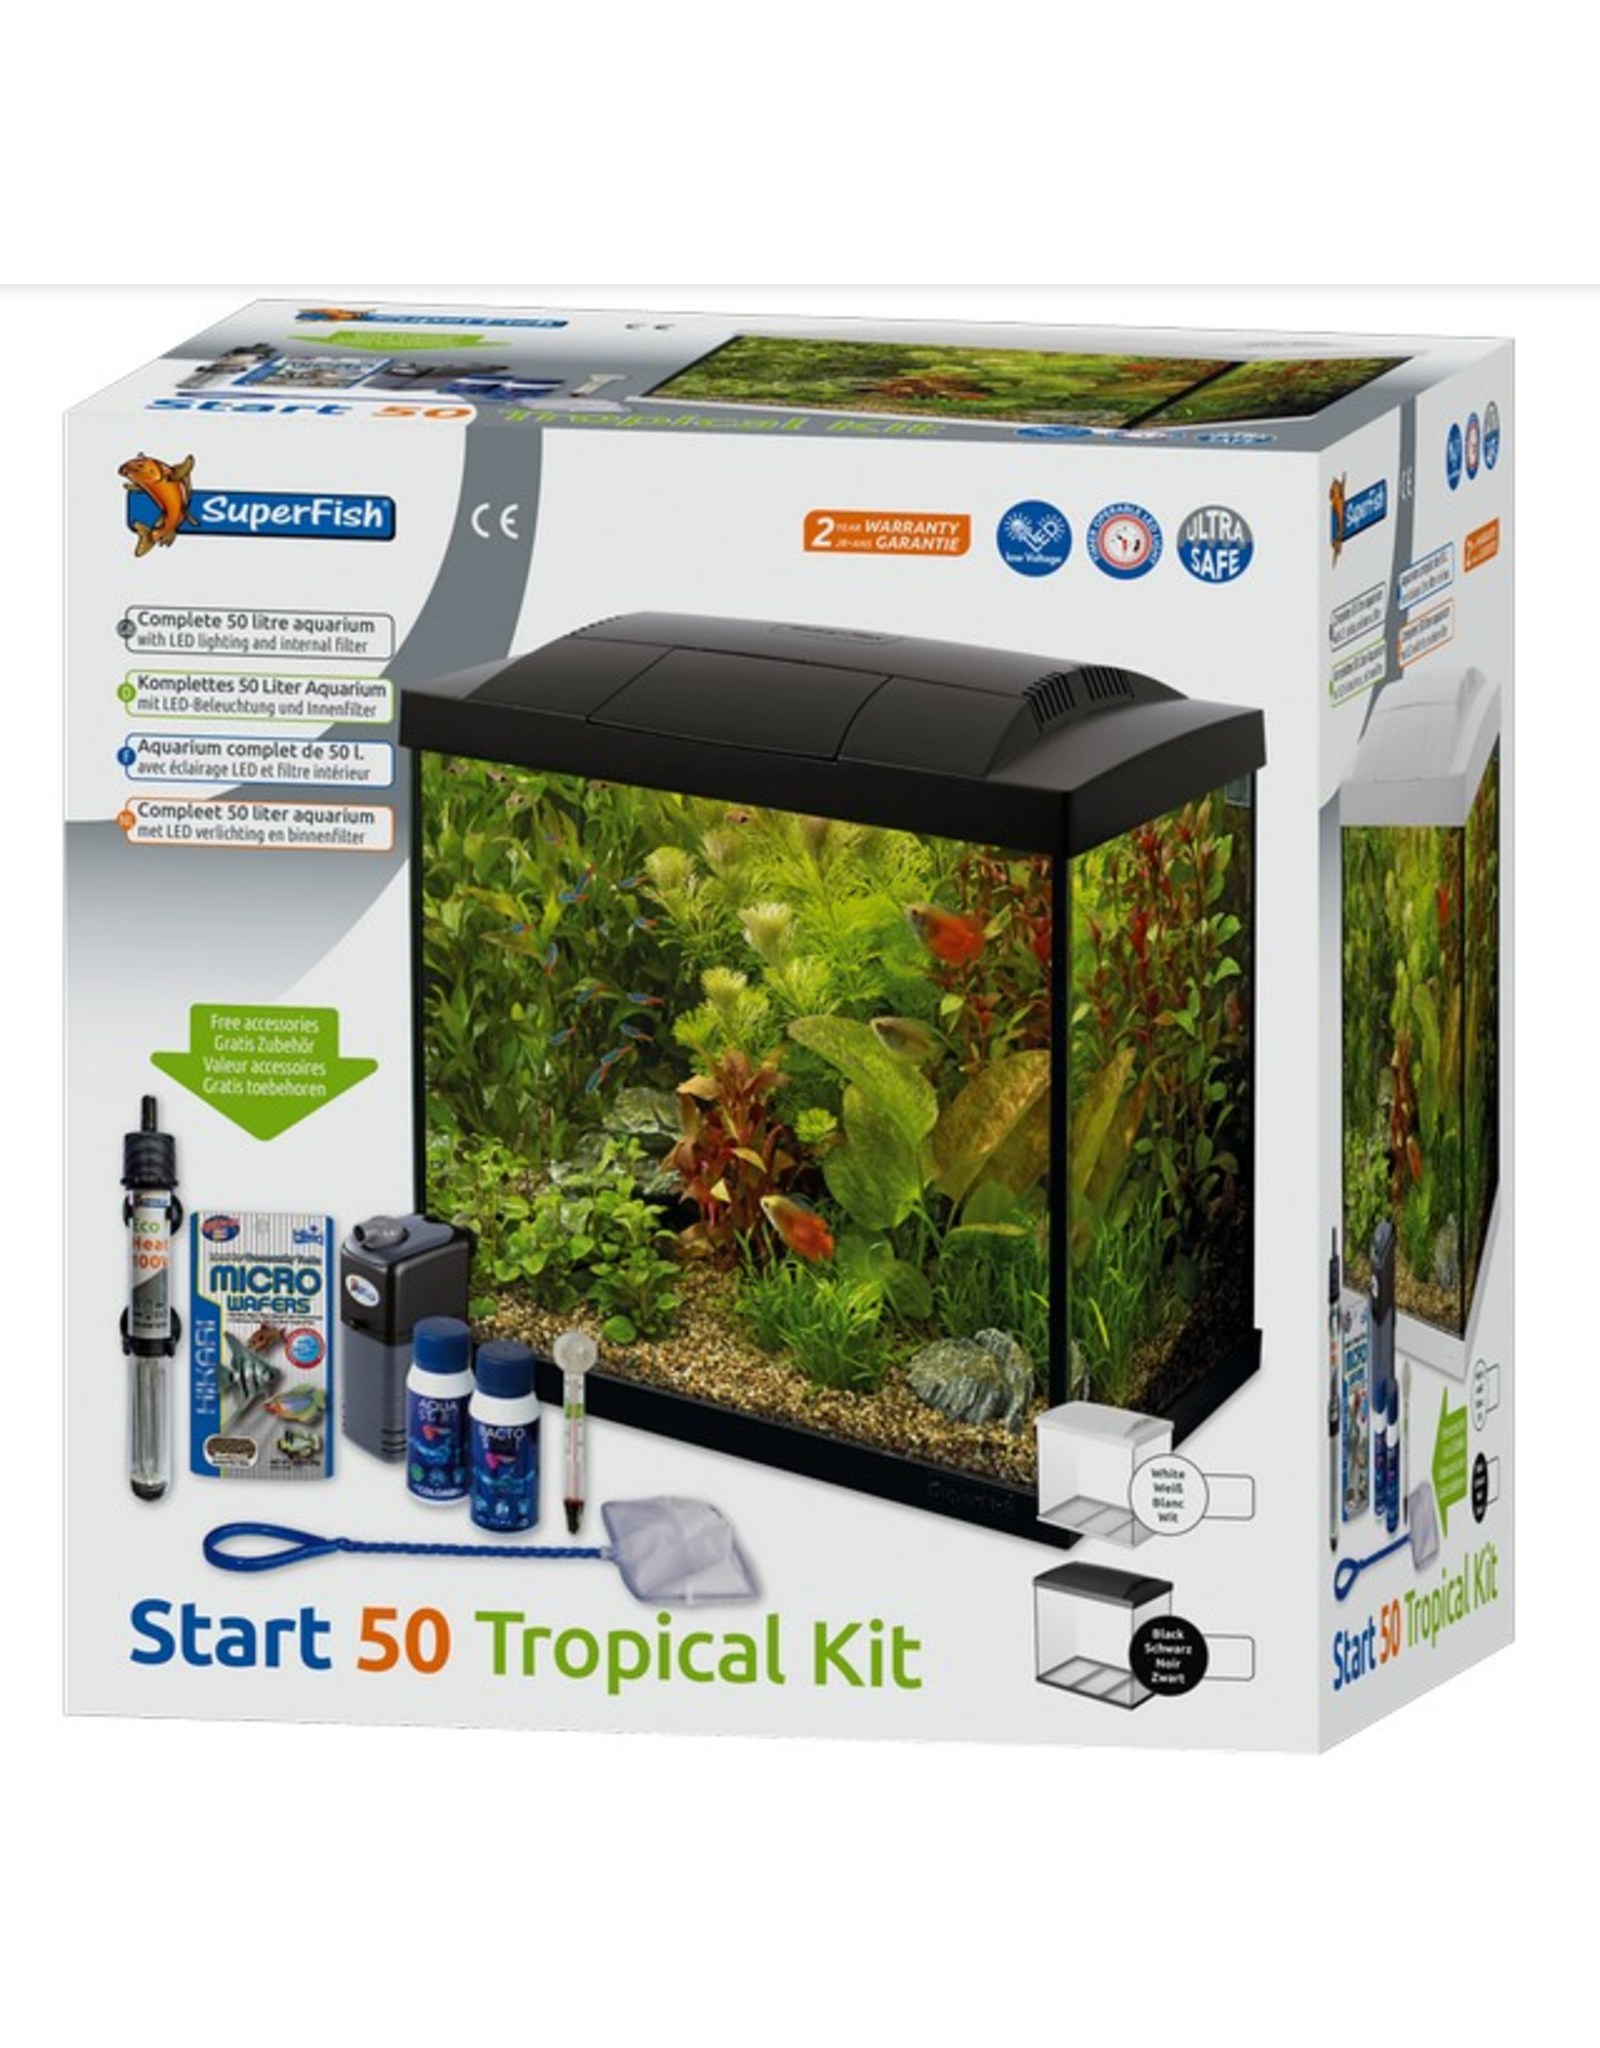 SuperFish SF Start 50 Tropical Kit Black